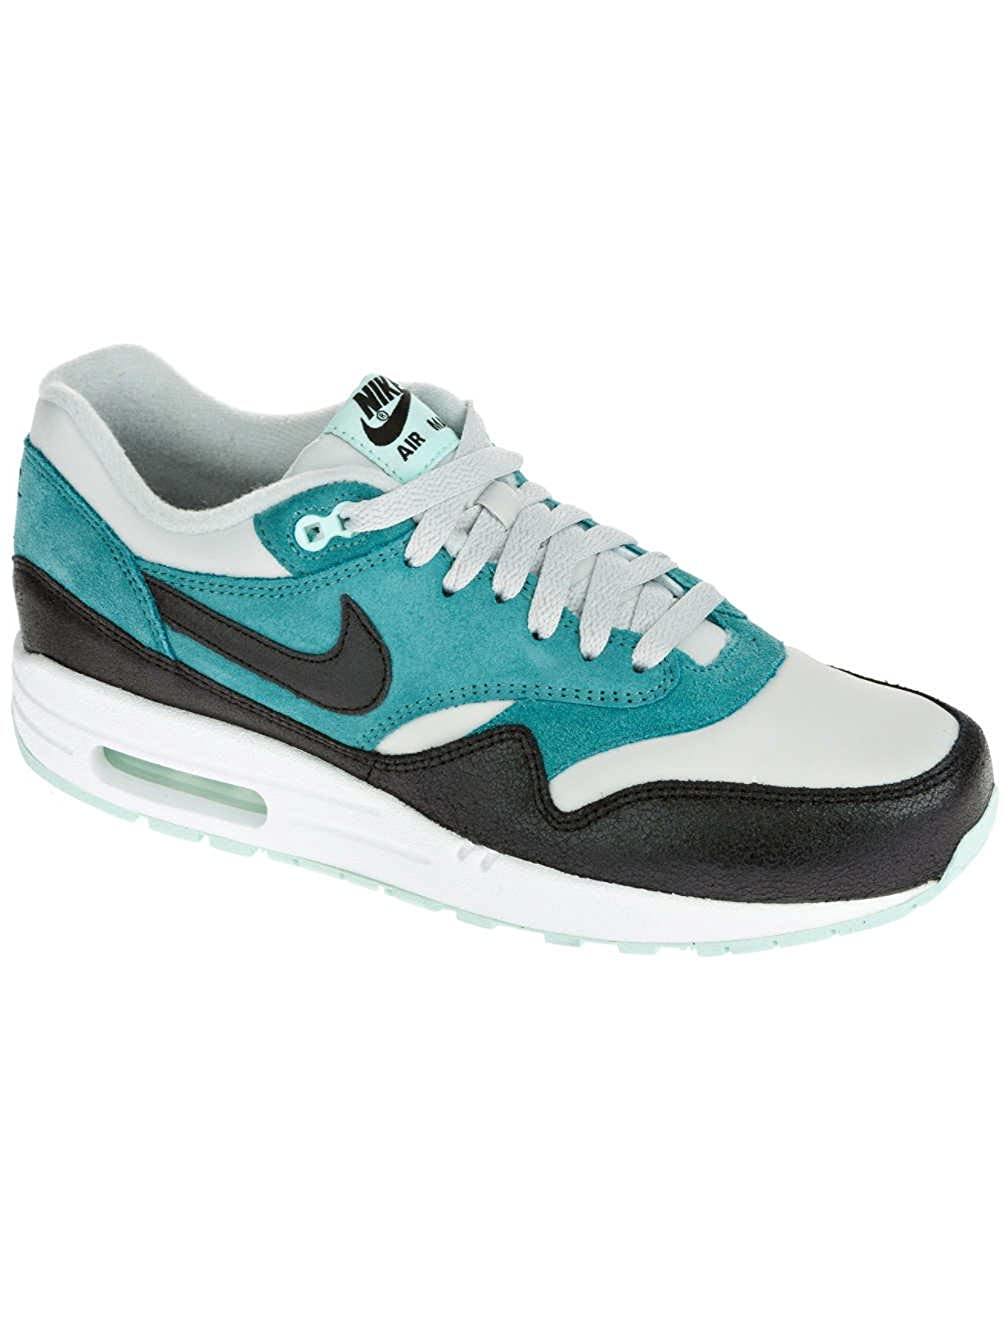 Womens Nike Air Max 1 Essential Dusty GreyBlackMineral Teal 599820 002 UK 6